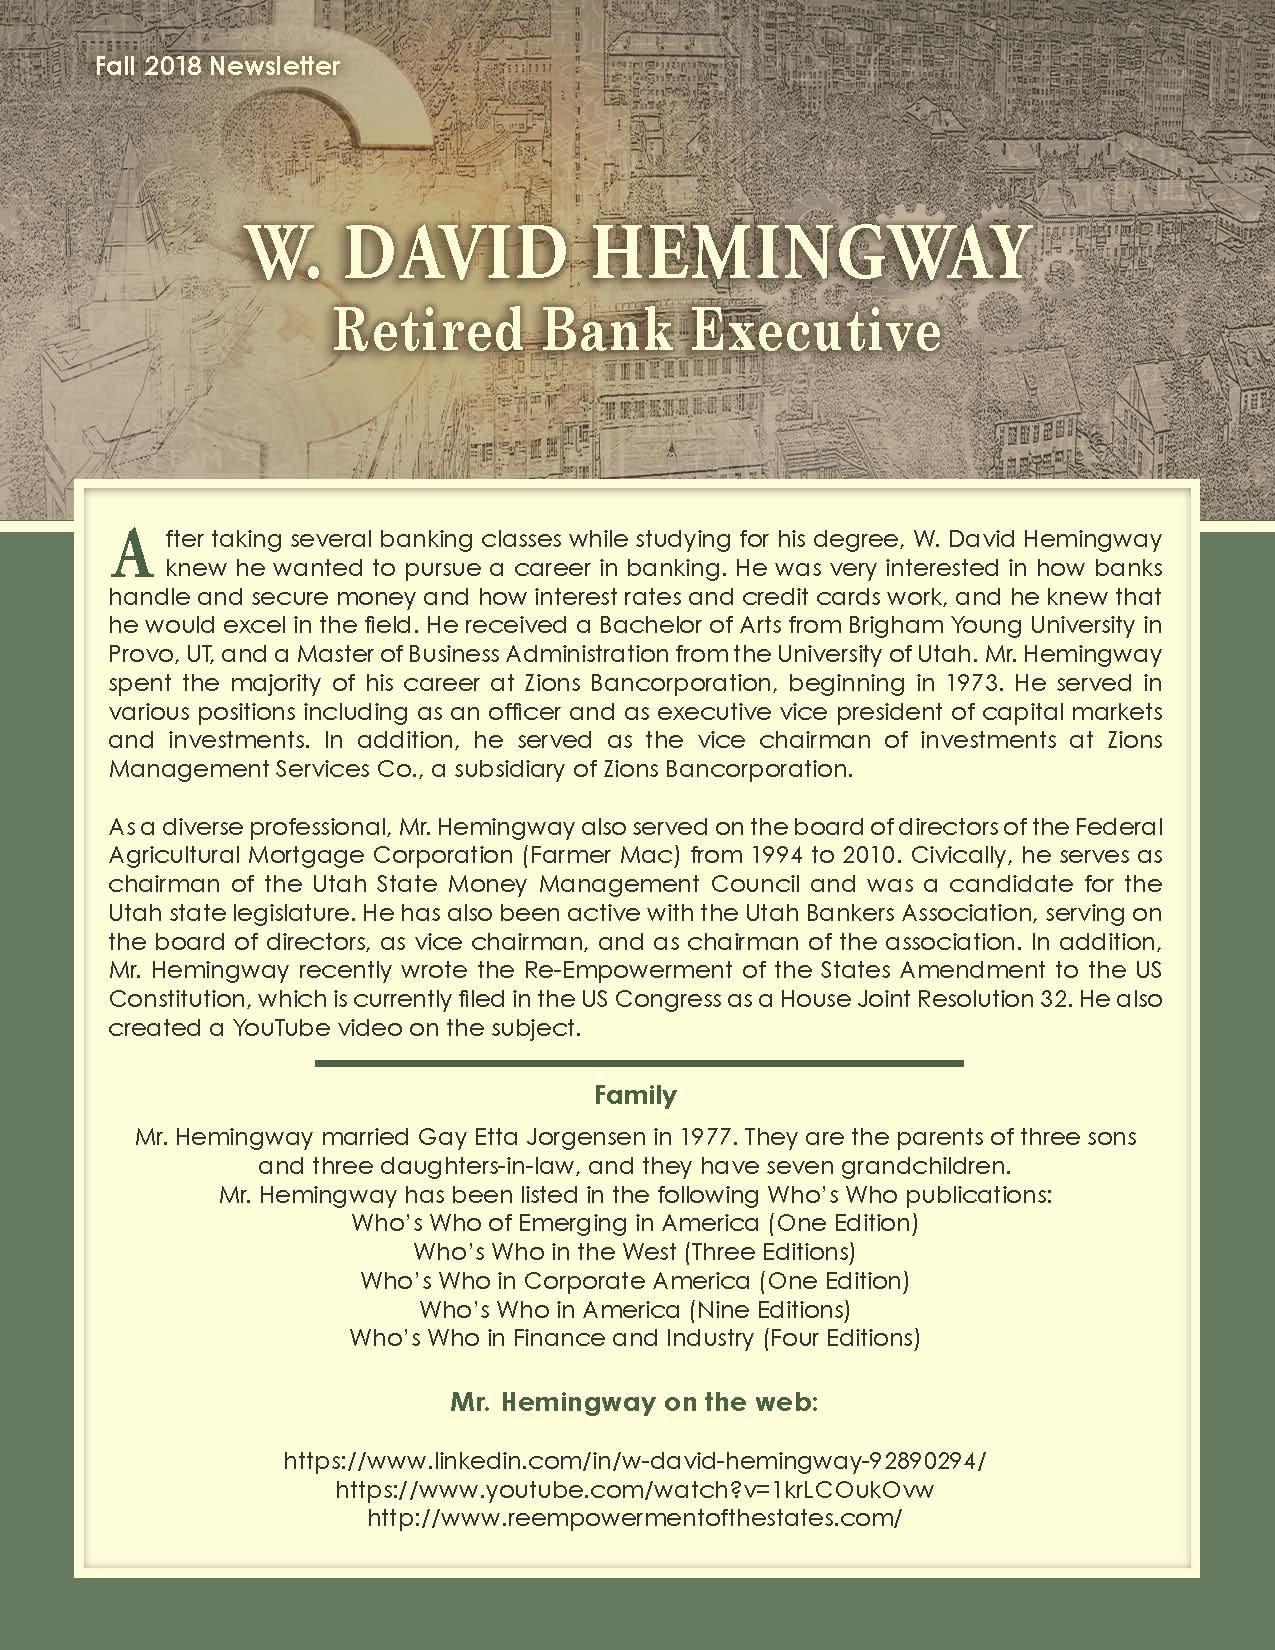 Hemingway, W David 4131767_252173 Newsletter.jpg